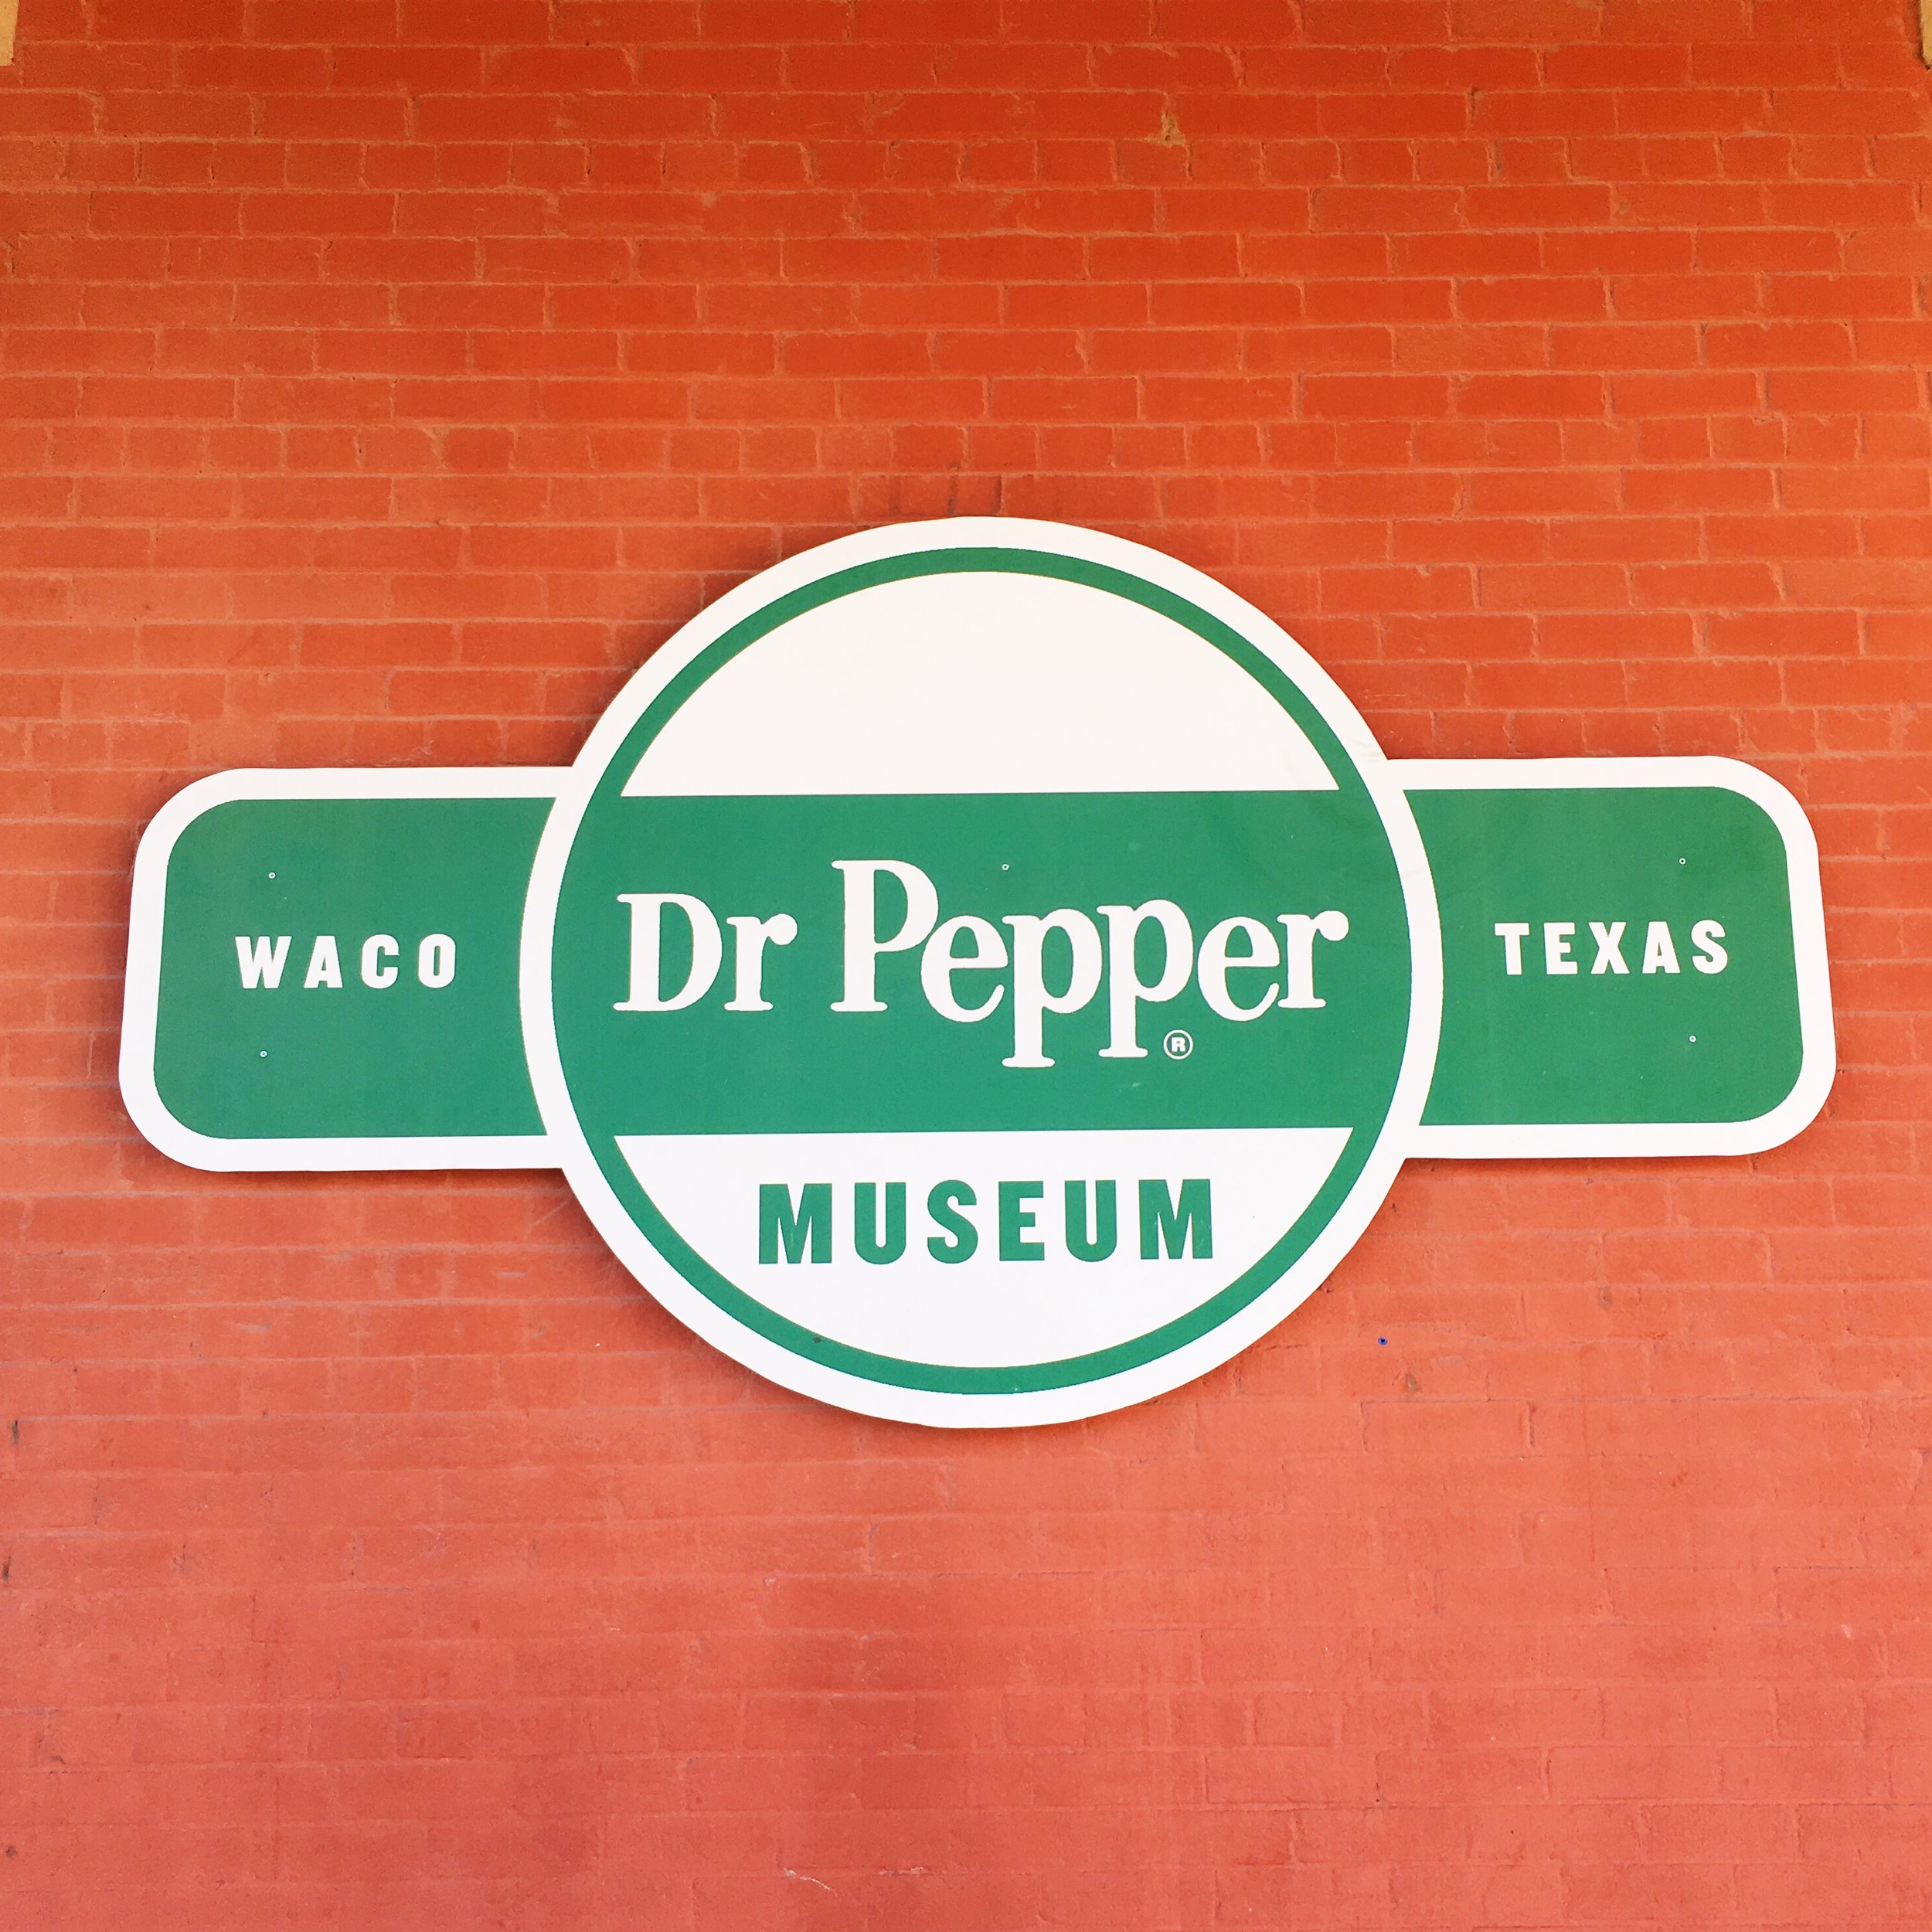 Dr Pepper Musuem - Things to do in Waco, Texas - Wander Dust Blog  (2).JPG